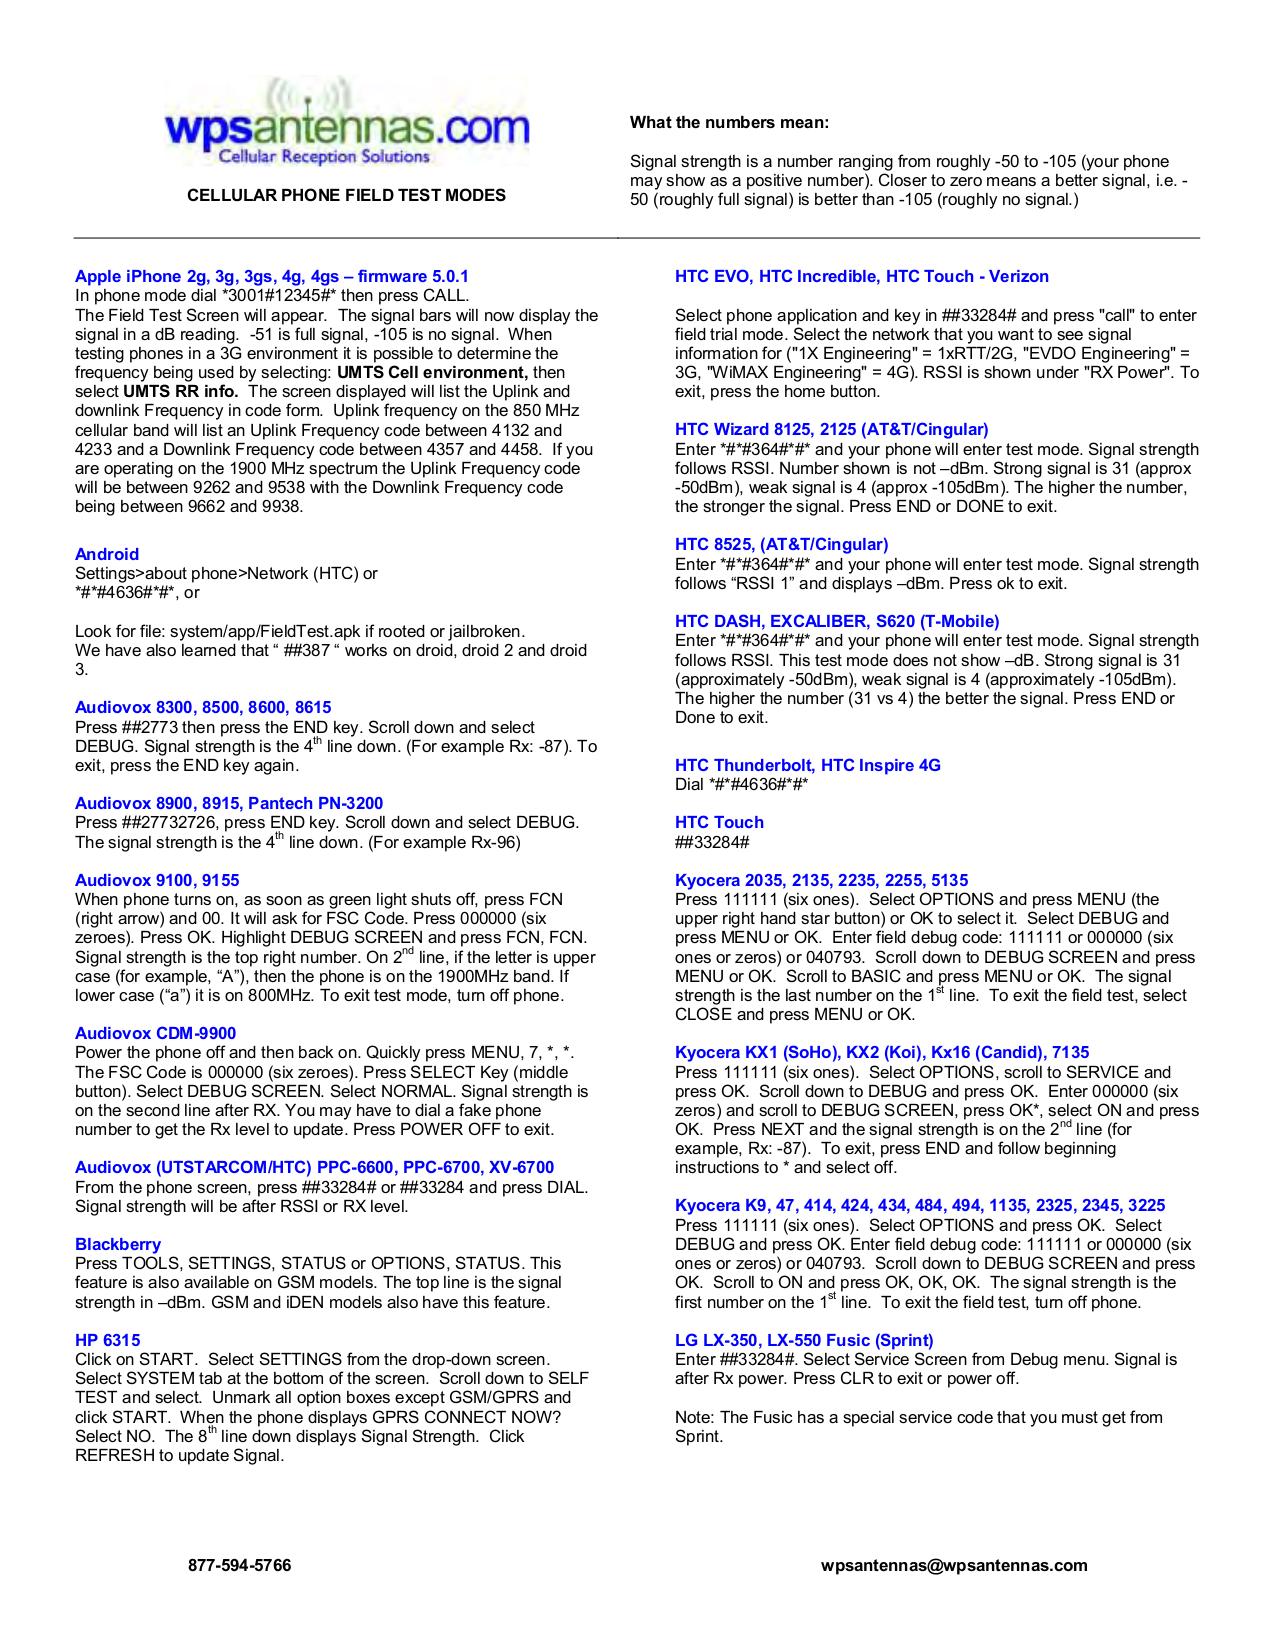 pdf for Samsung Cell Phone SGH-E105 manual